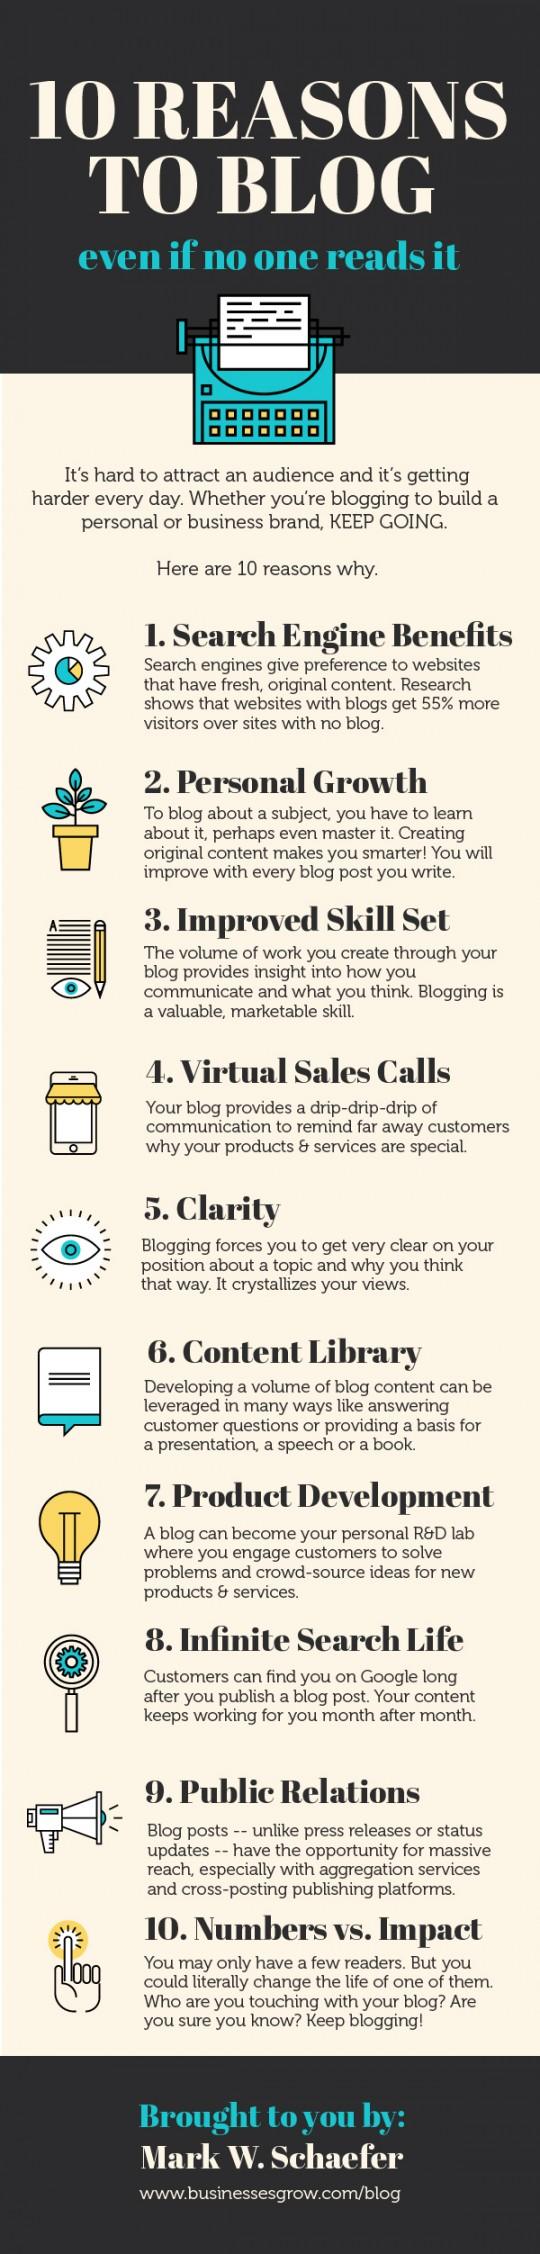 10-reasons-to-blog